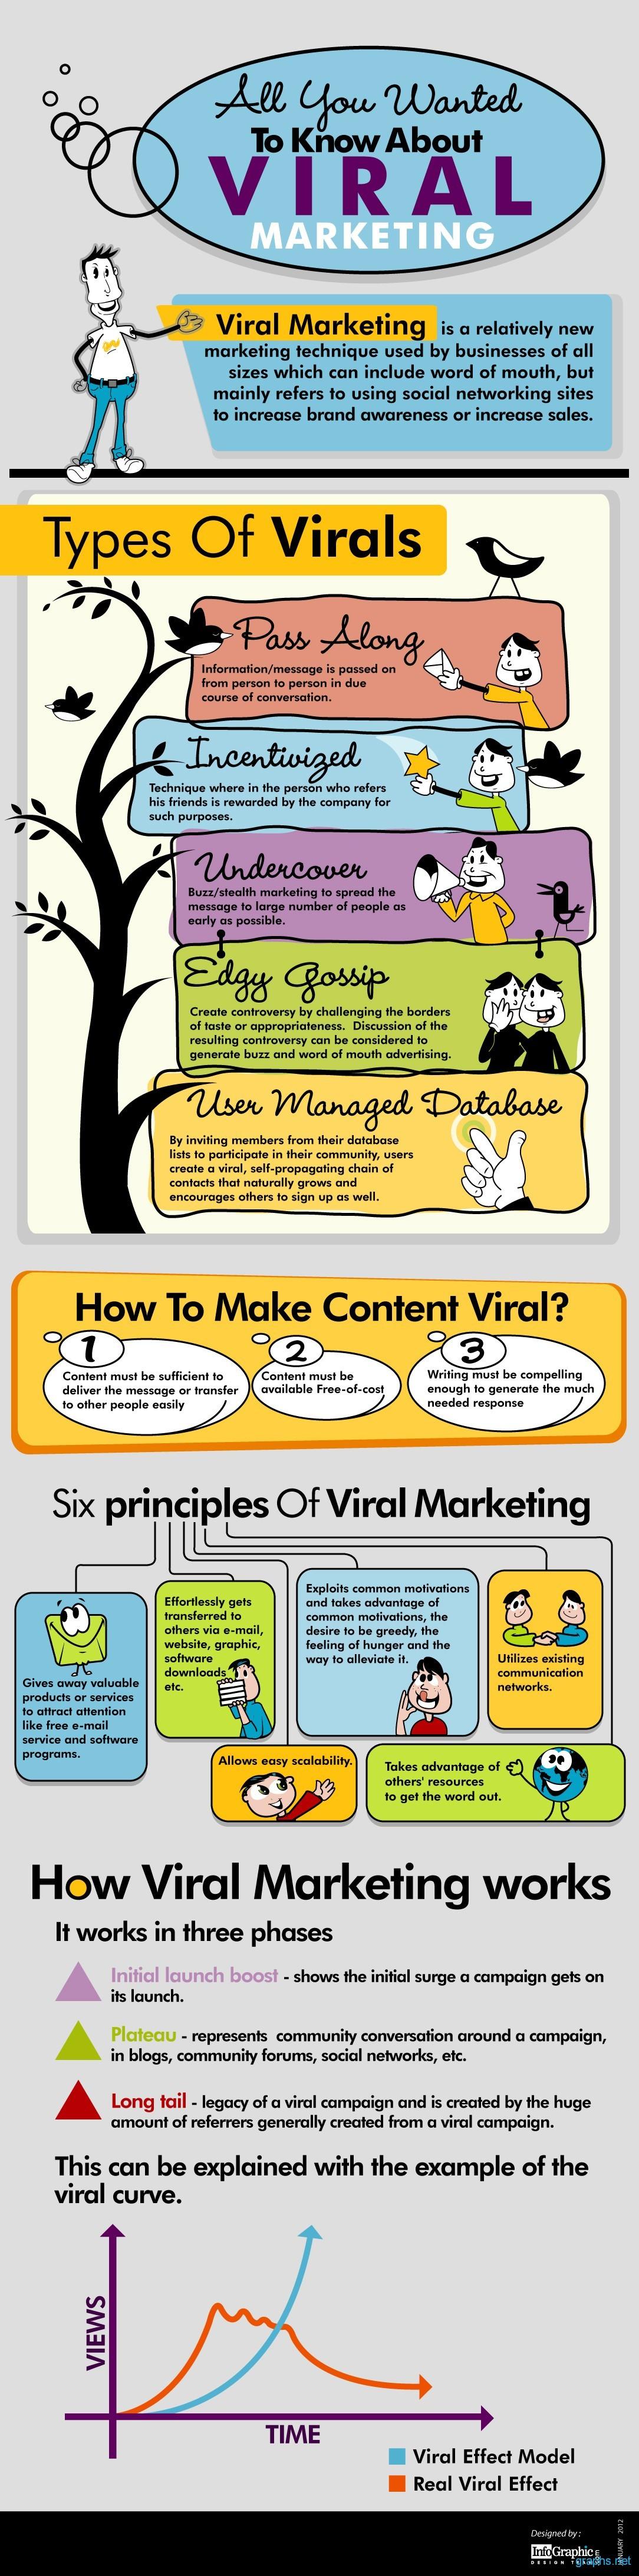 Information on Viral Marketing